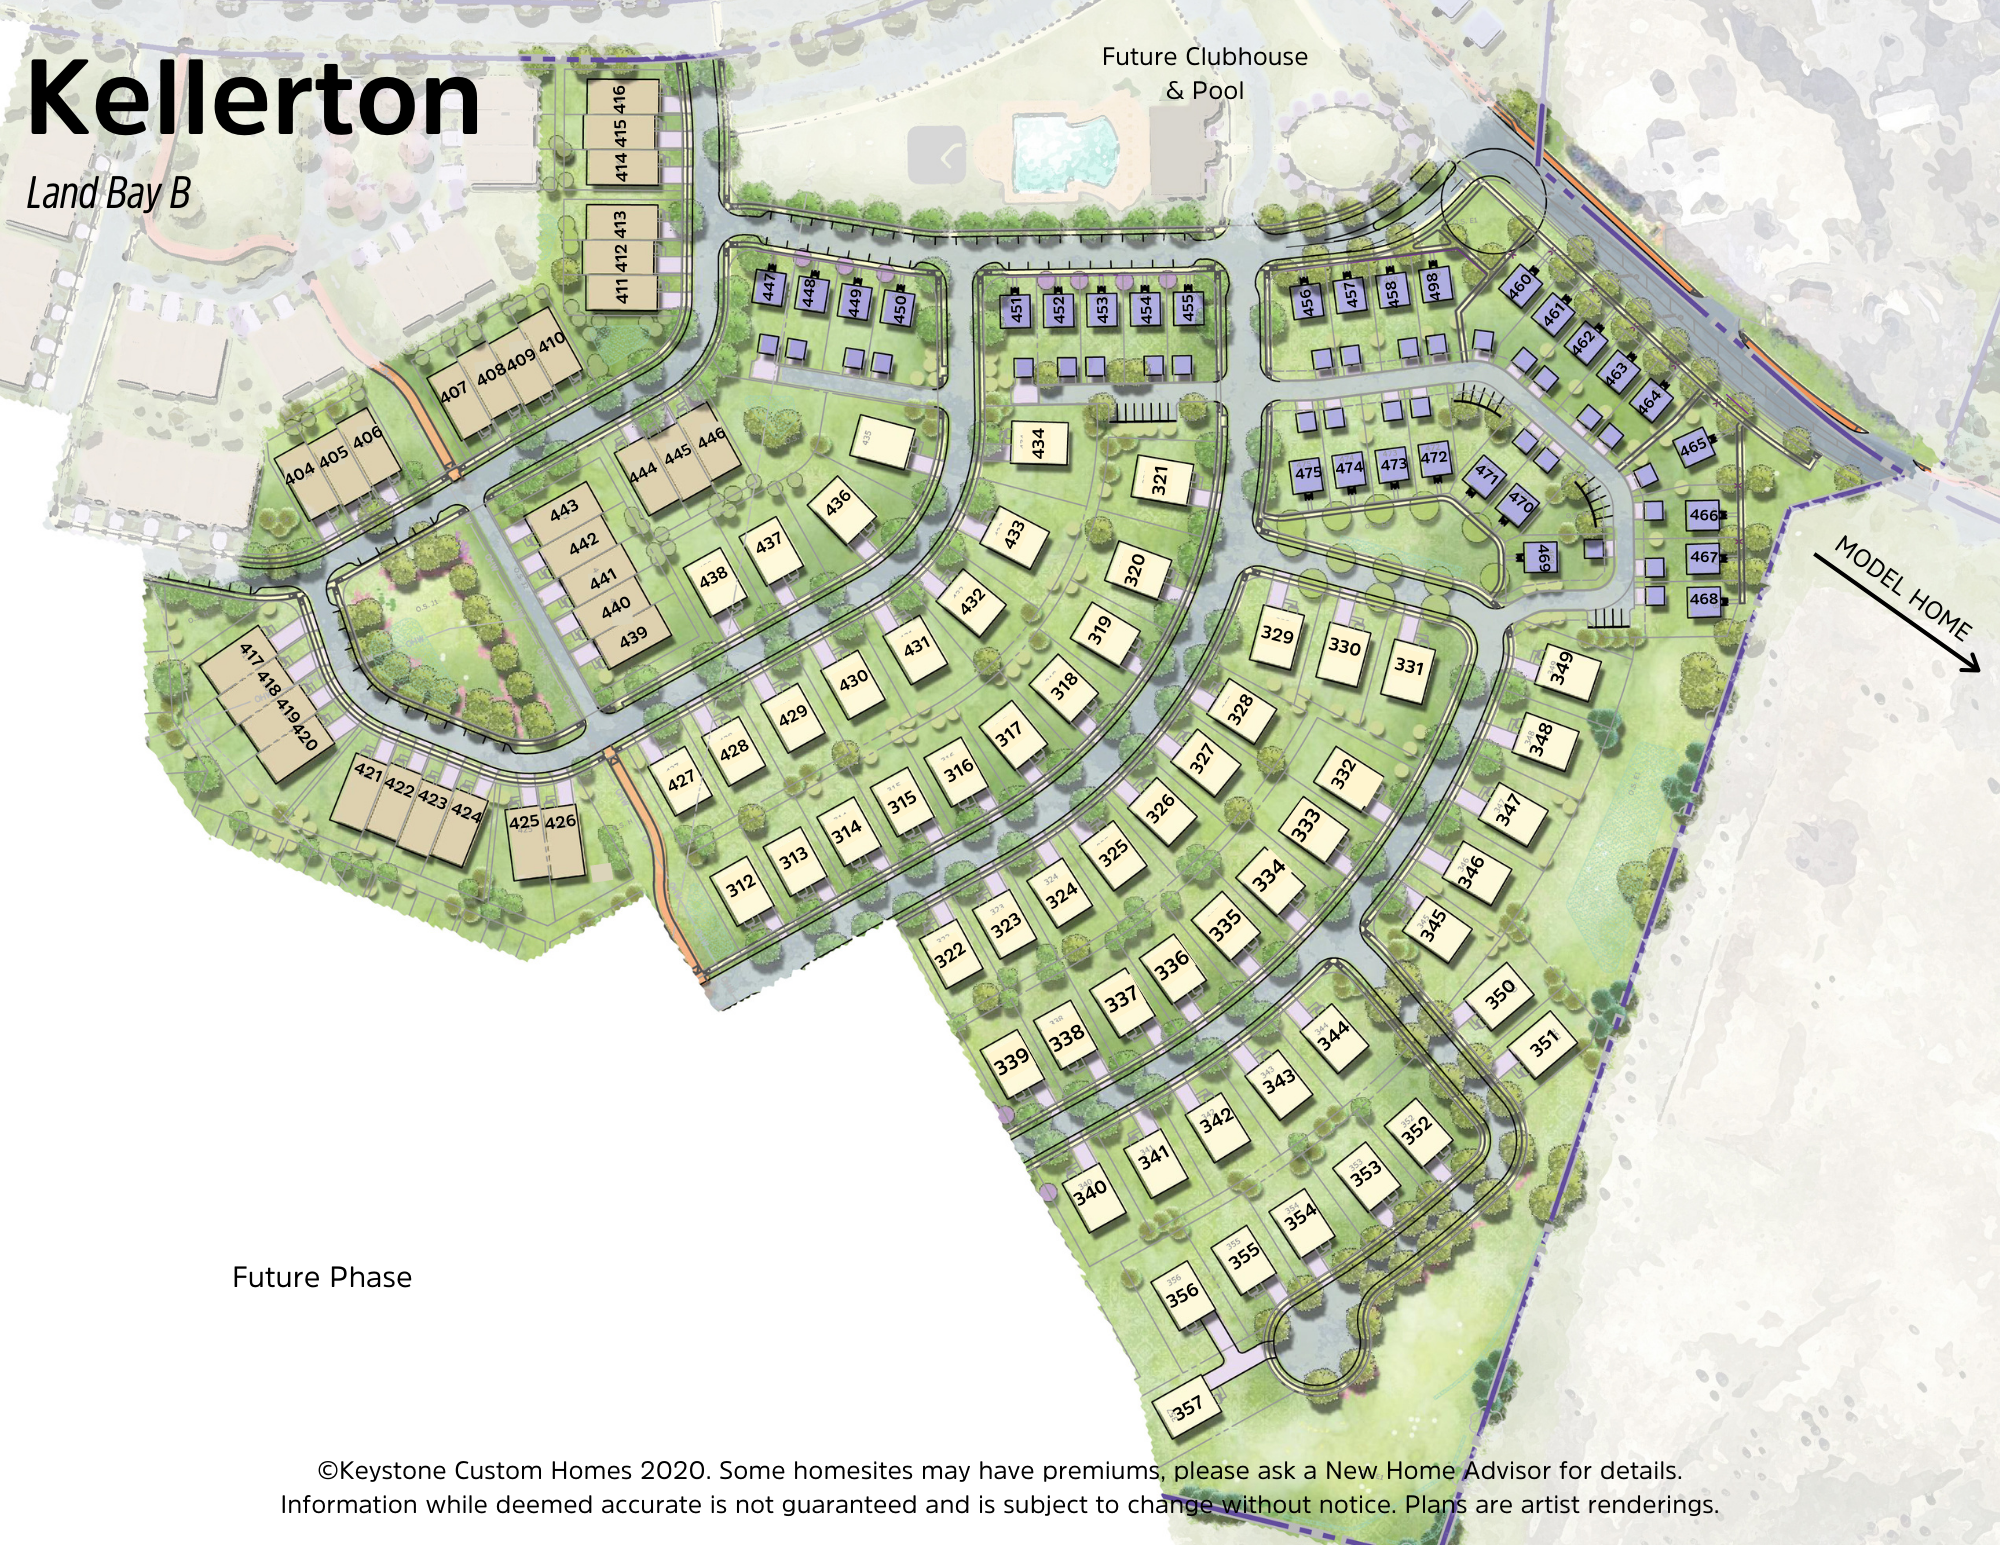 Kellerton Villas Lot Map Background